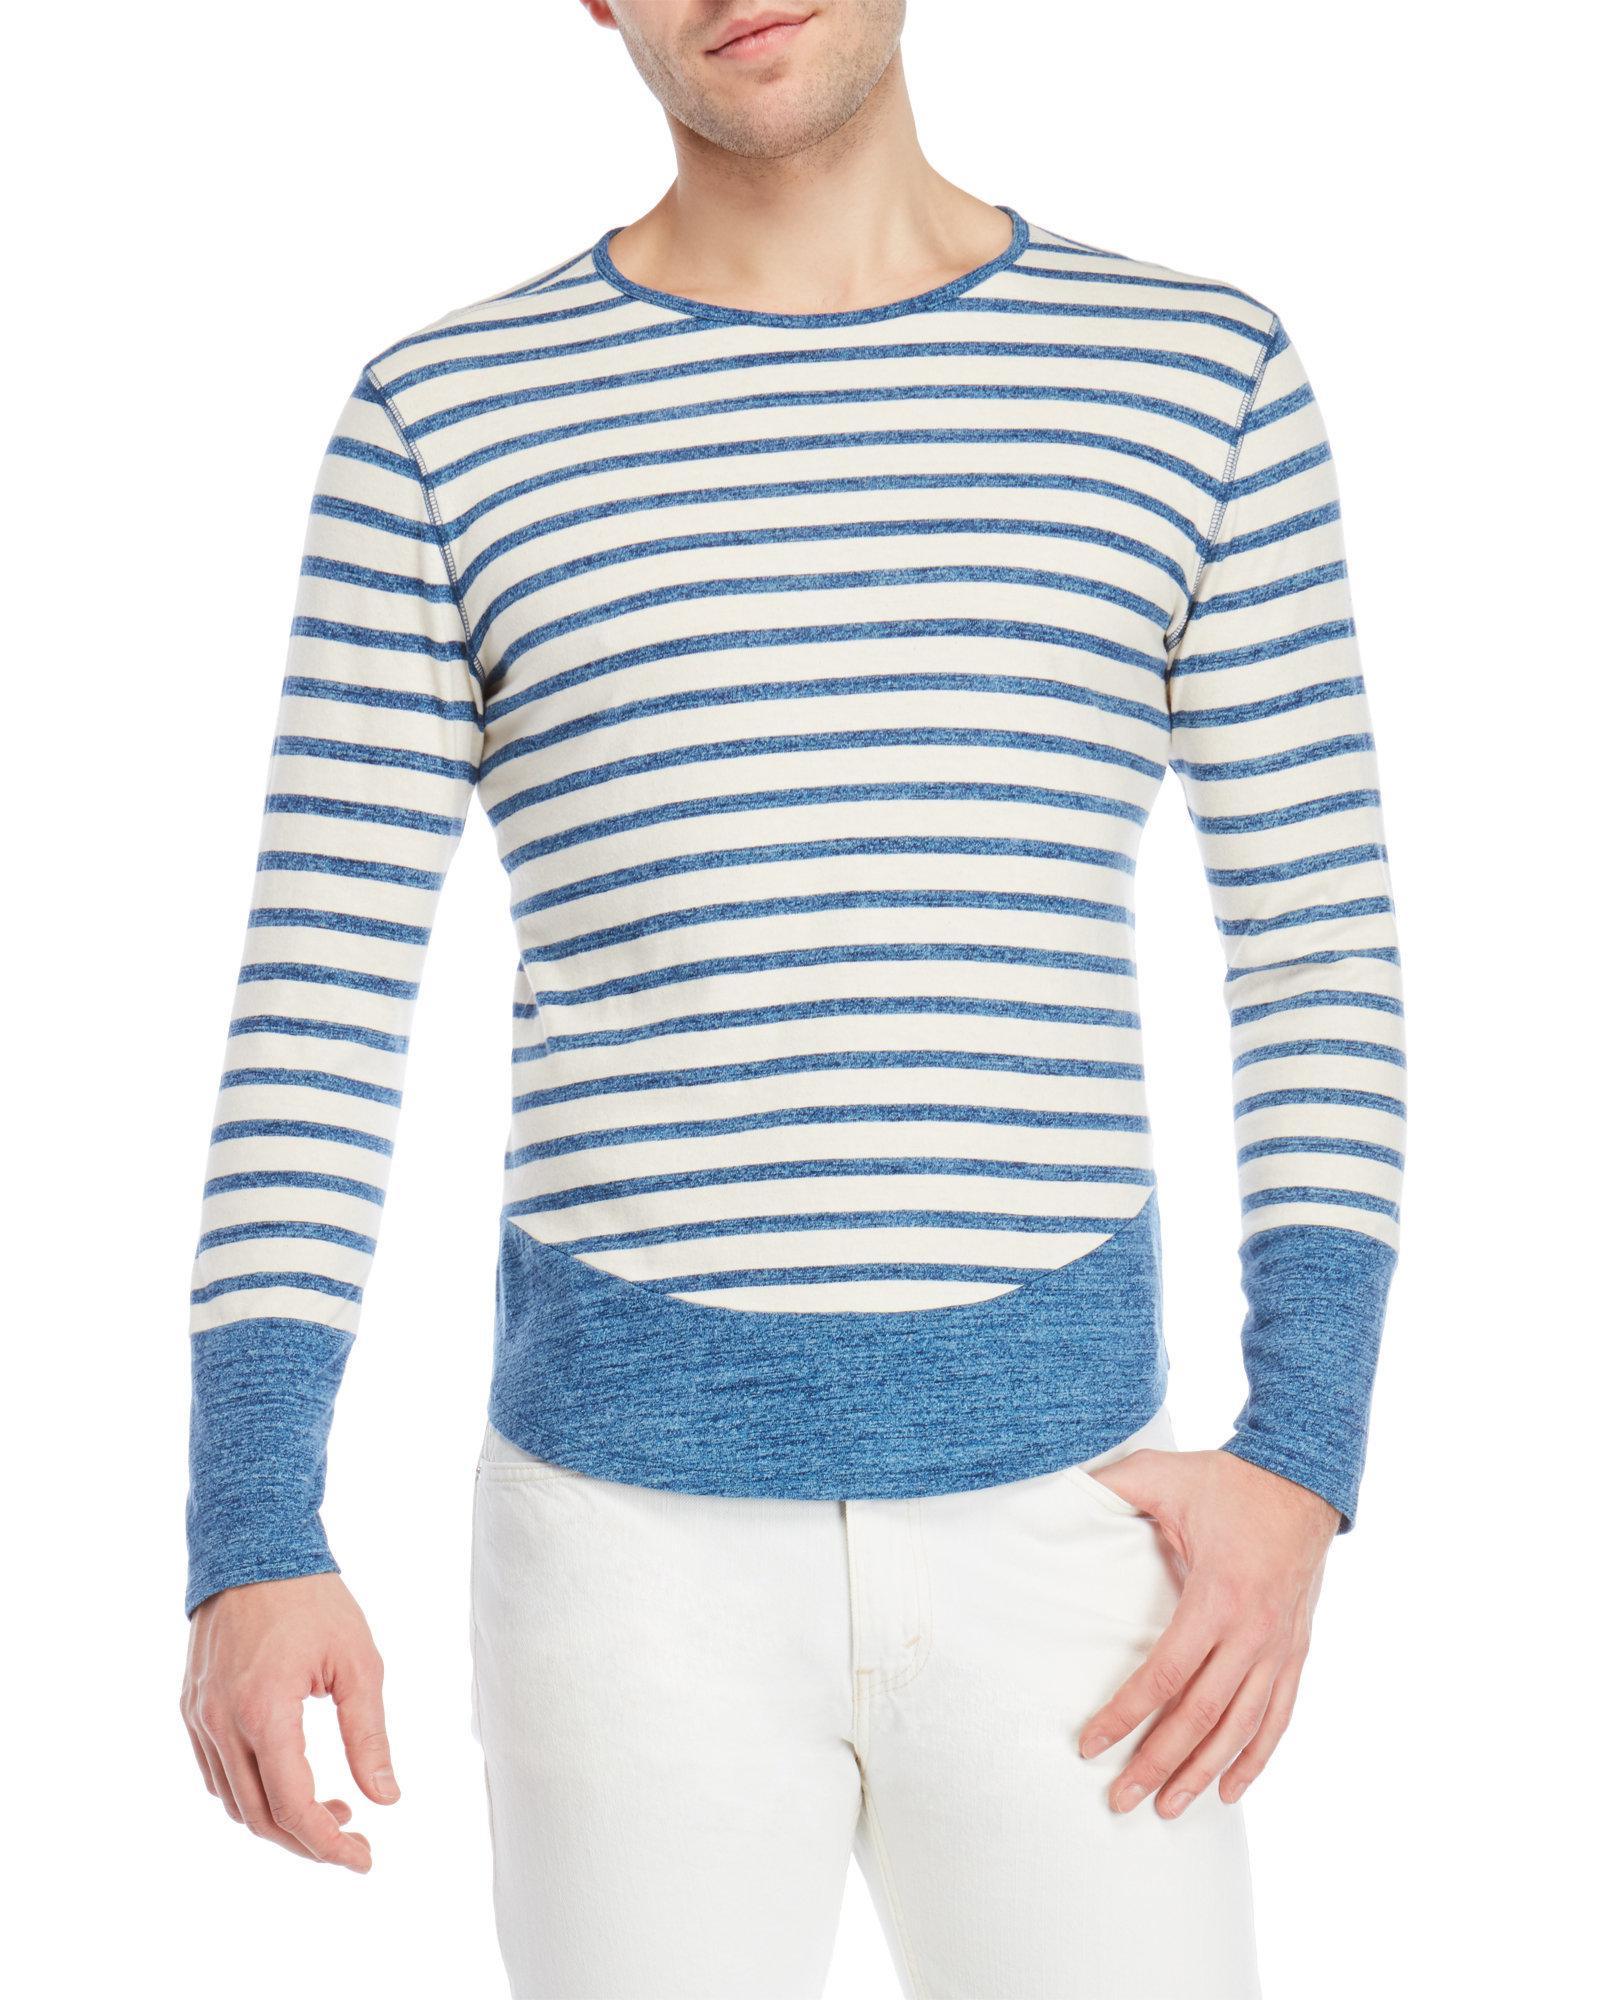 Free Shipping Cheap Cheap Amazon Mens Rib-Knit Linen-Blend T-Shirt Max uu9valw